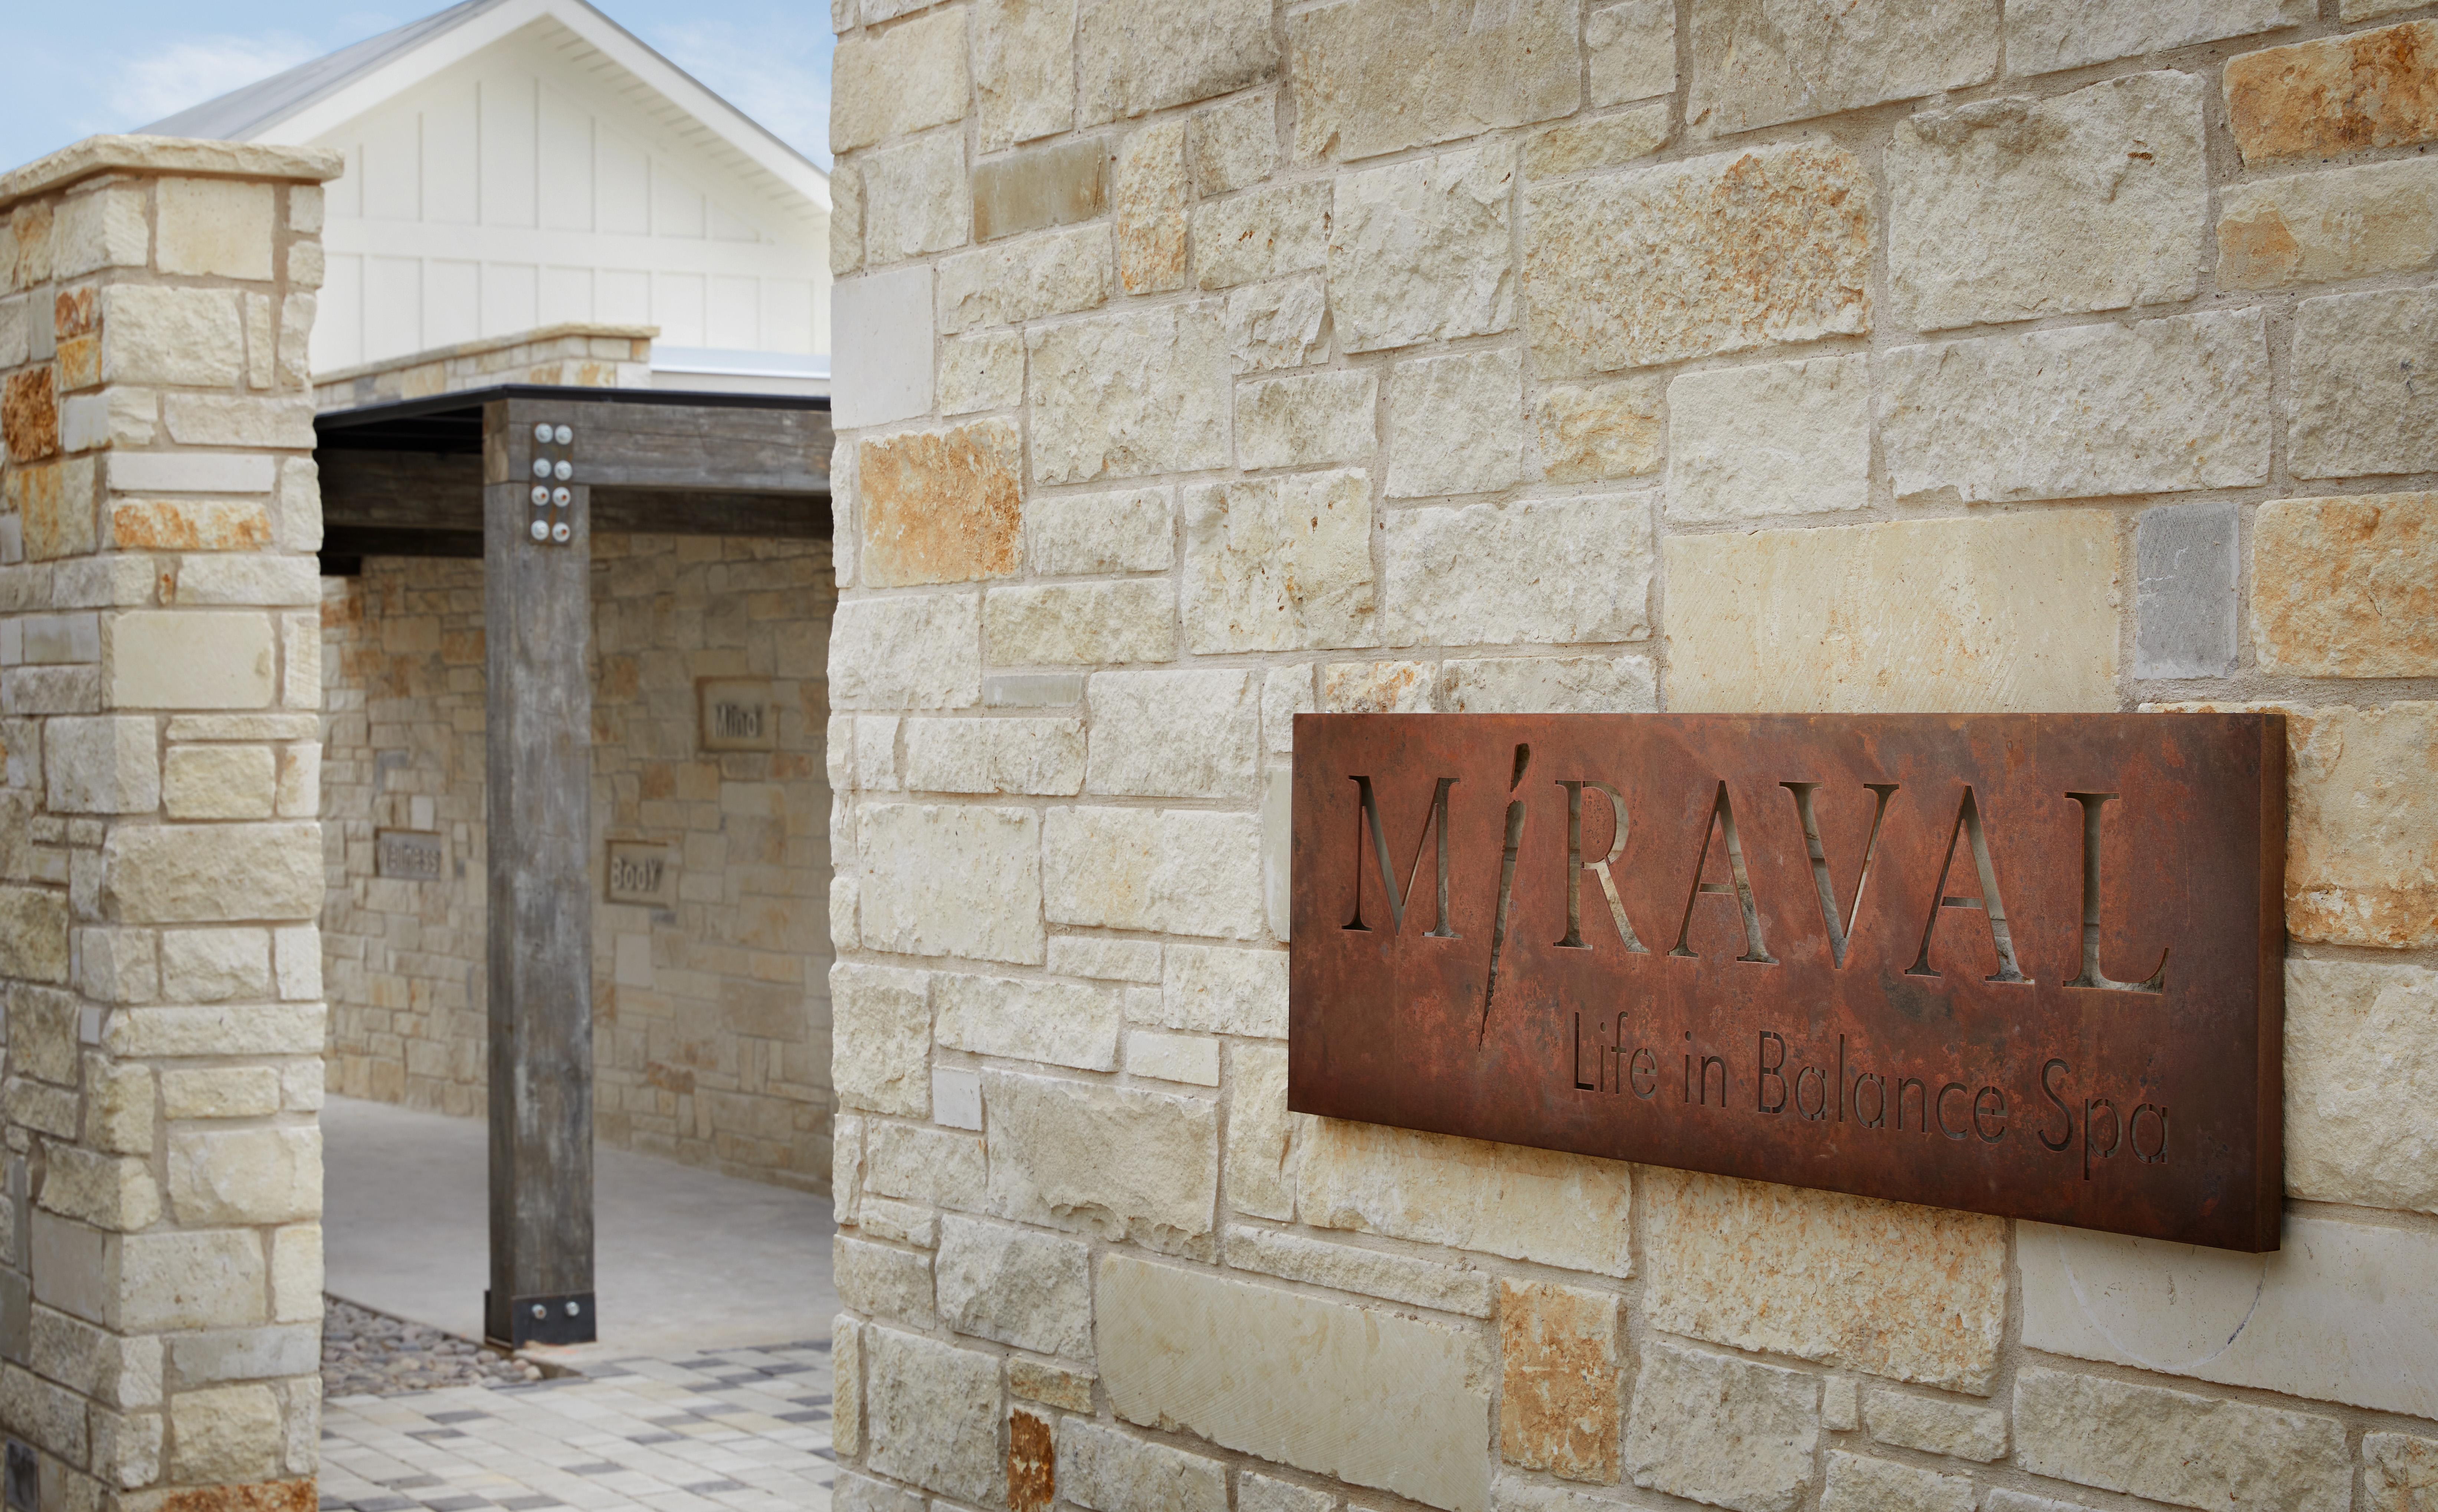 Miraval Austin entrance // Courtesy of James Baigrie for Miraval Austin